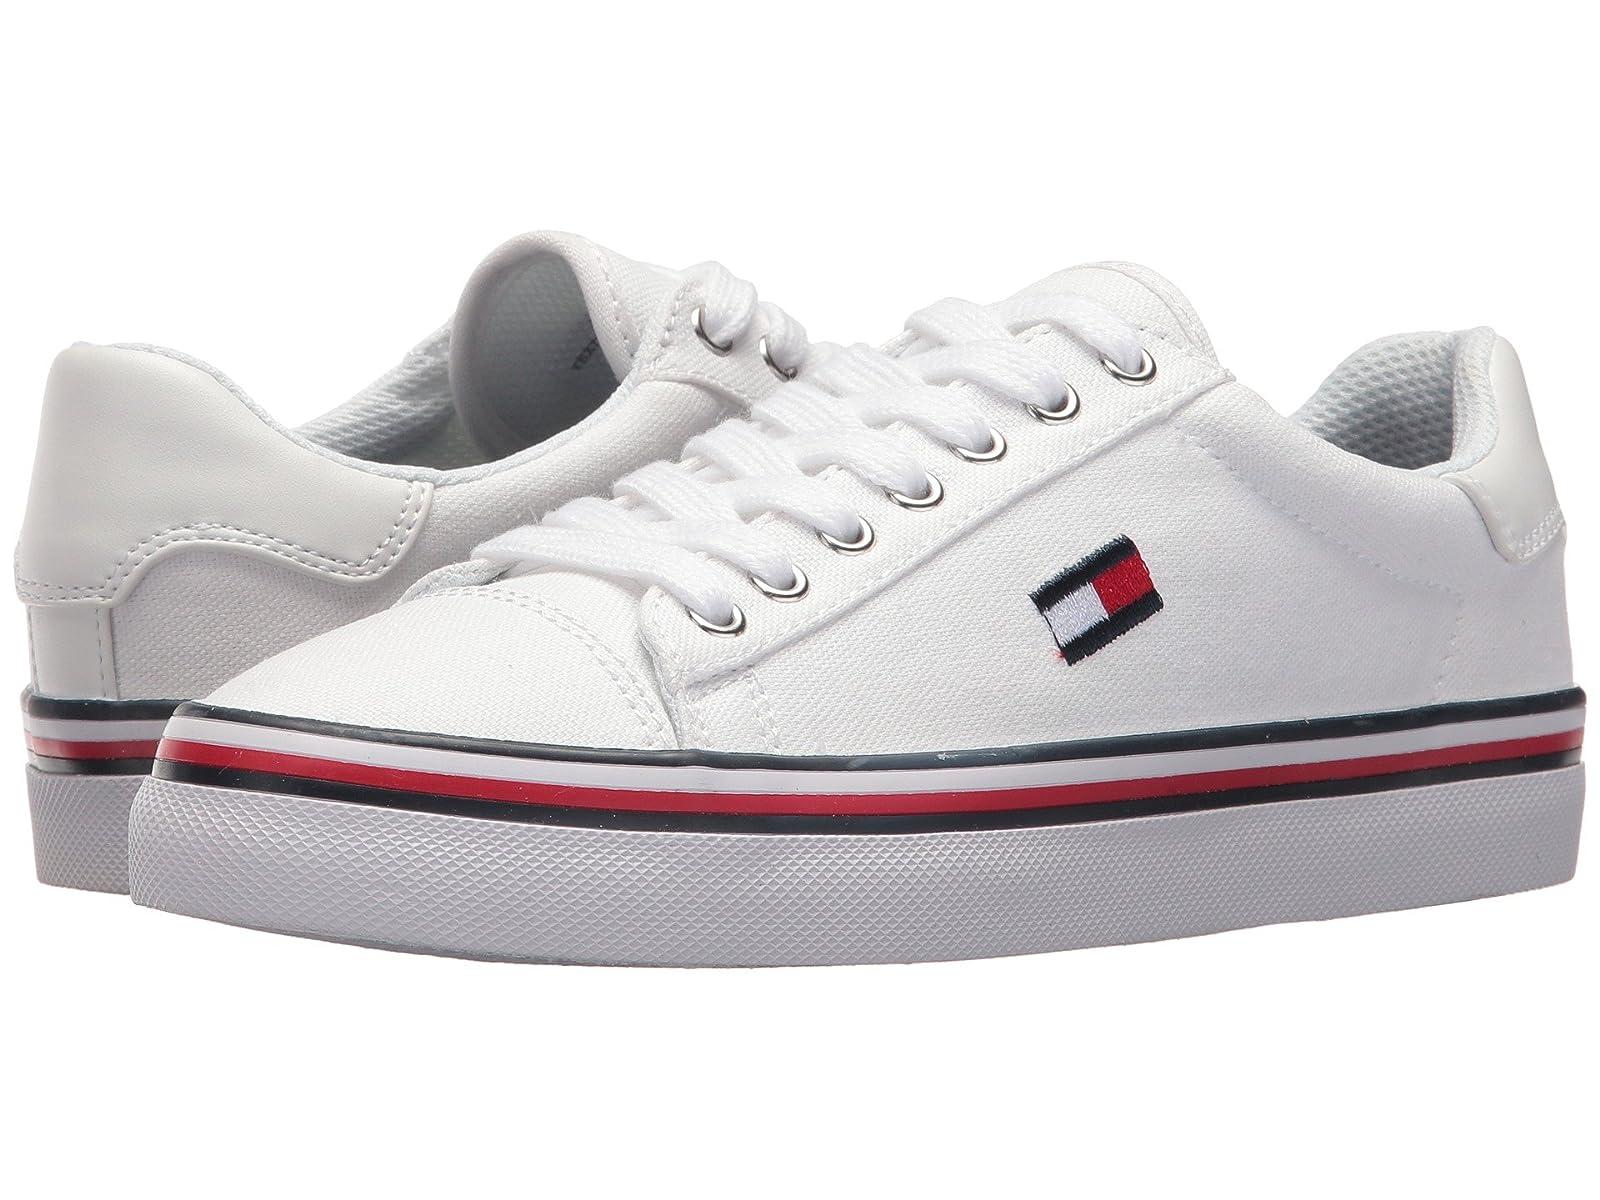 Tommy Hilfiger FressianAtmospheric grades have affordable shoes